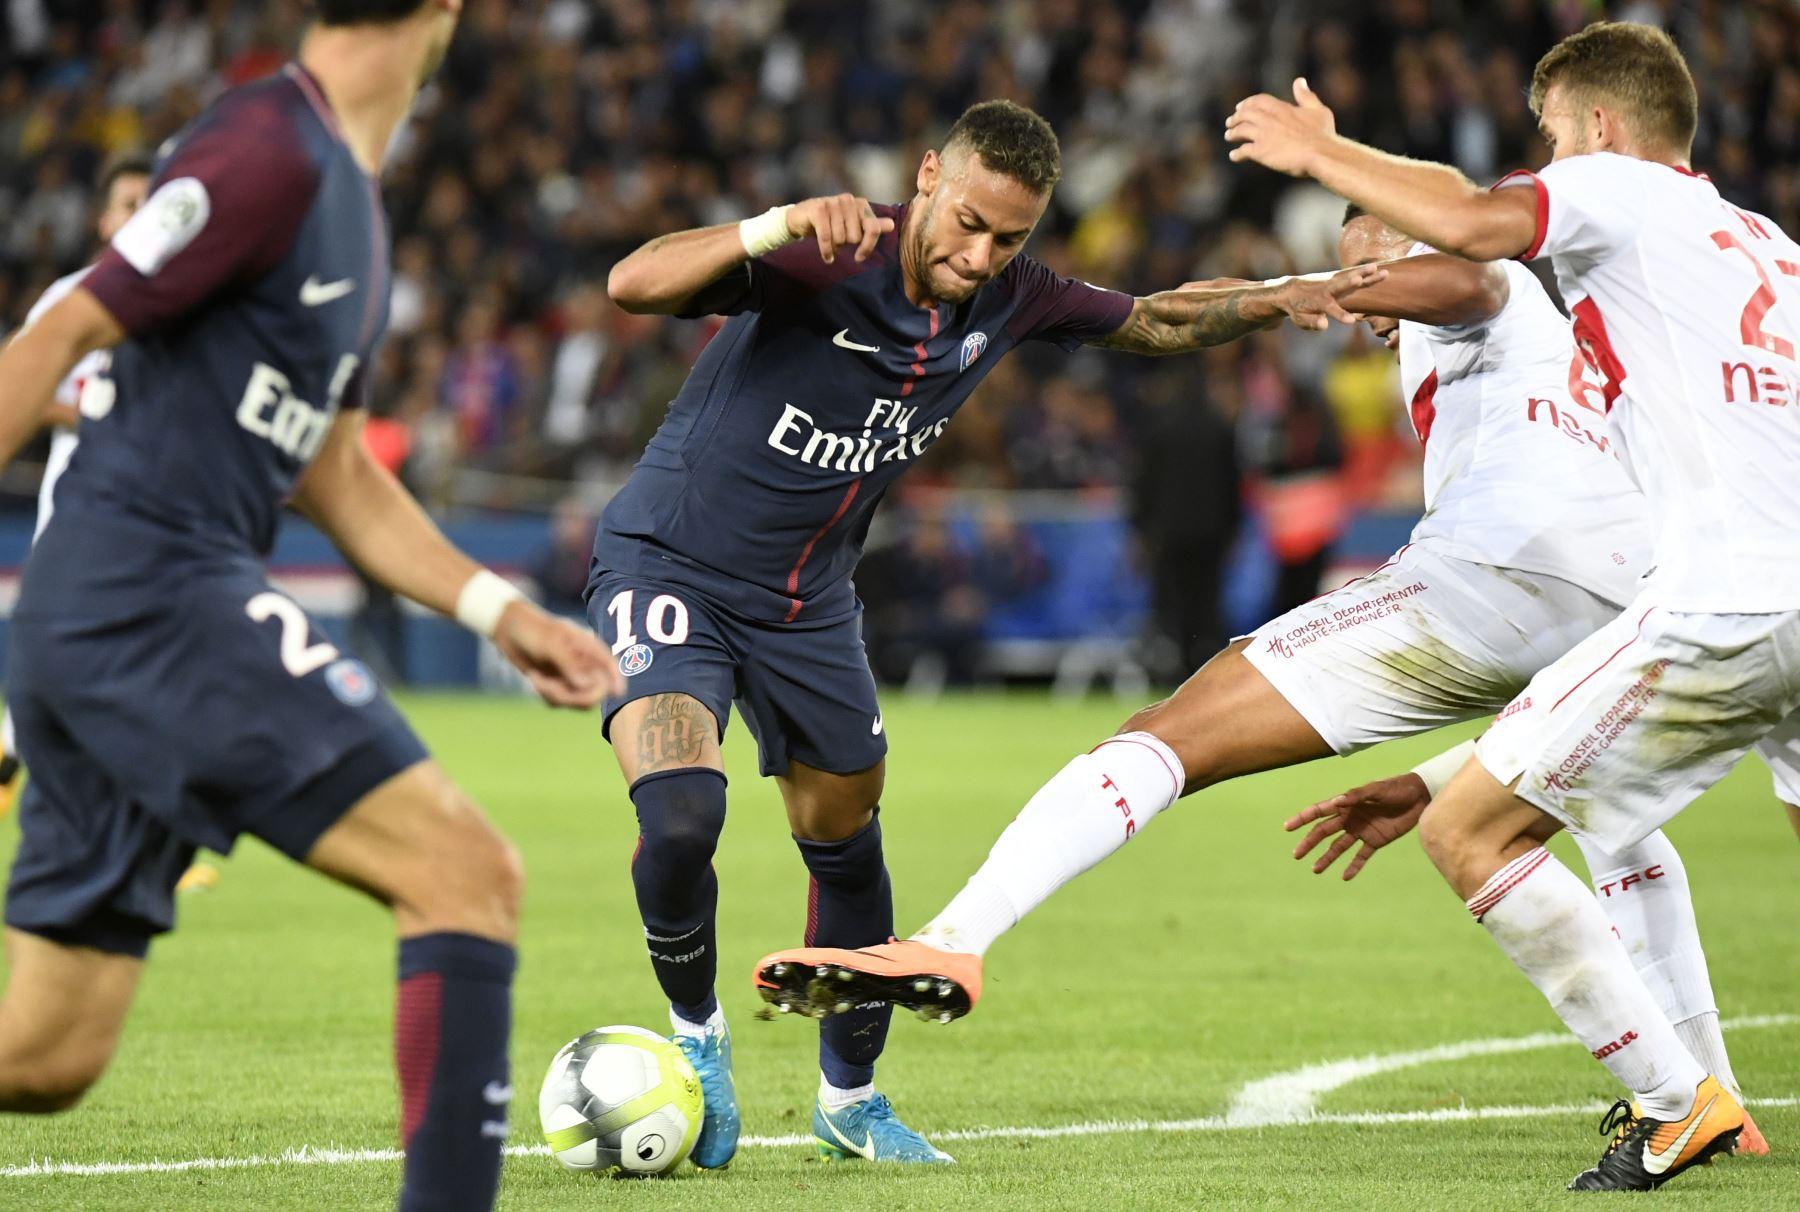 Neymar marca durante el partido de fútbol francés L1 Saint-Germain (PSG) vs Toulouse FC (TFC) en el Parc des Princes en París.Foto:AFP